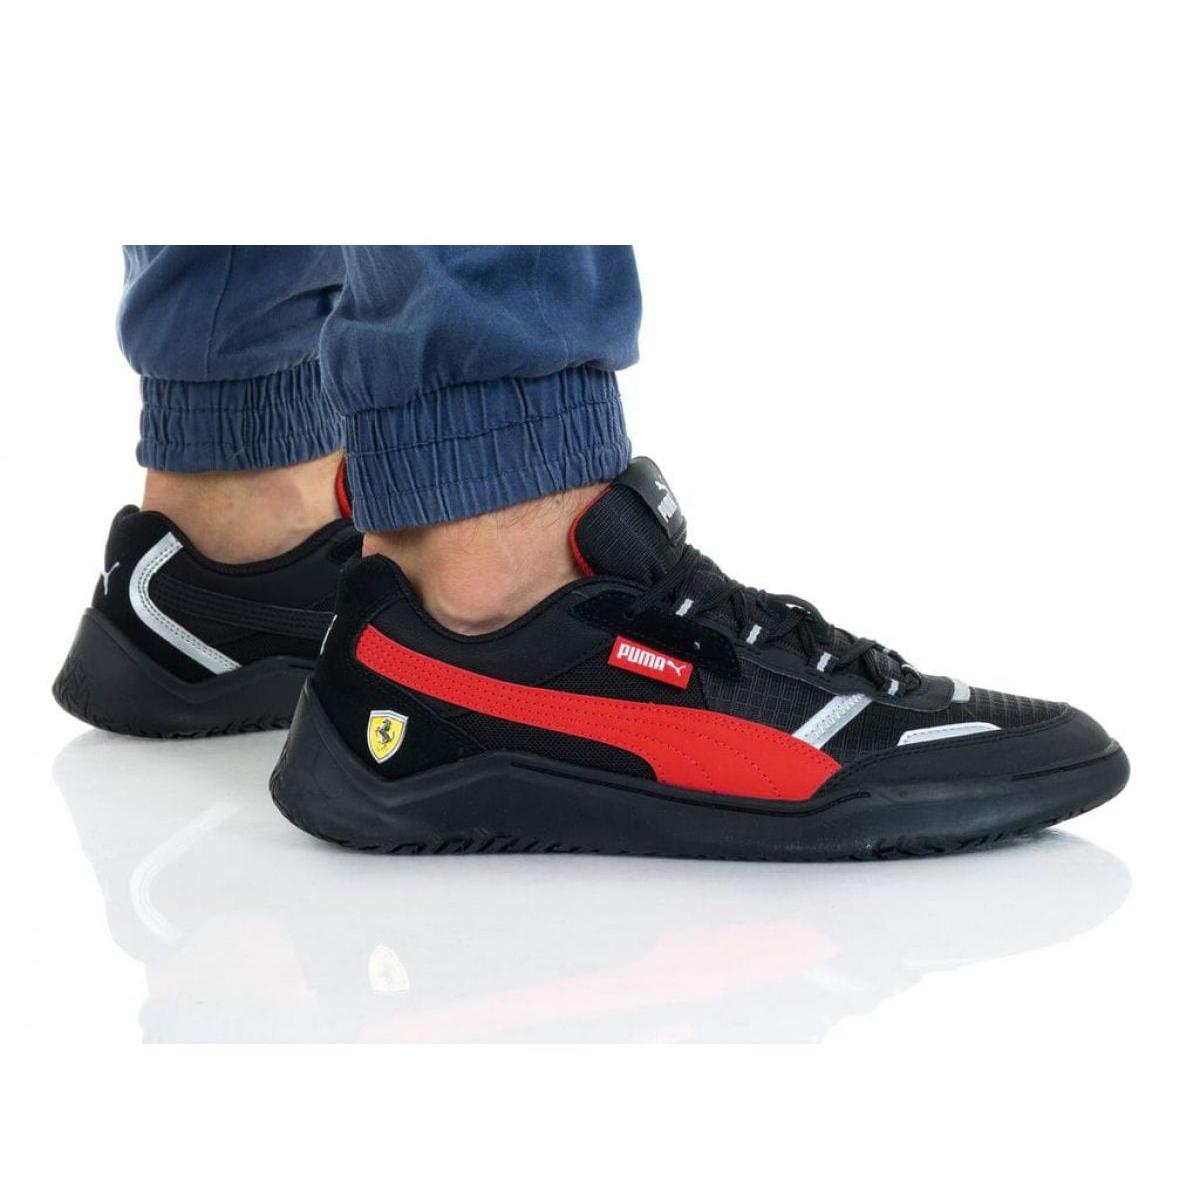 Puma Ferrari Race Dc Future M 306539 01 black red - KeeShoes